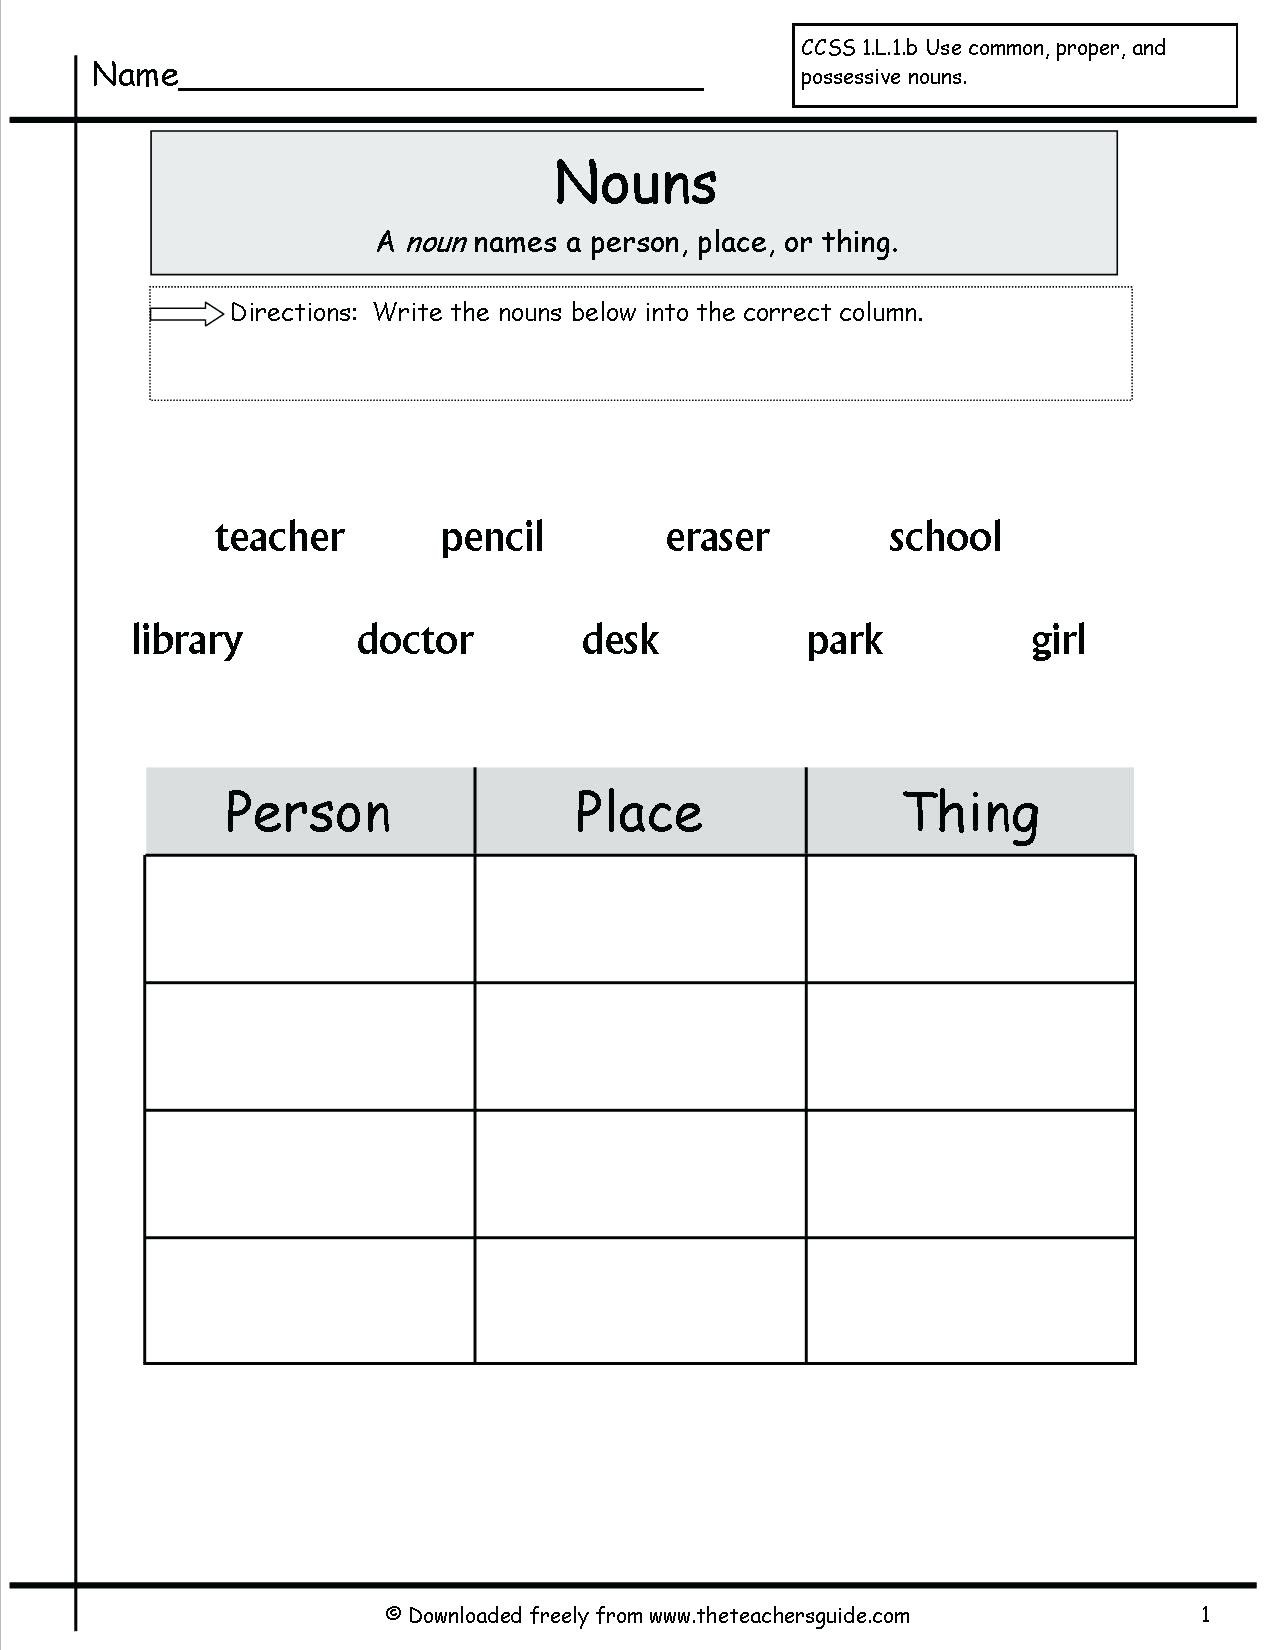 5 Free Math Worksheets Second Grade 2 Measurement Convert